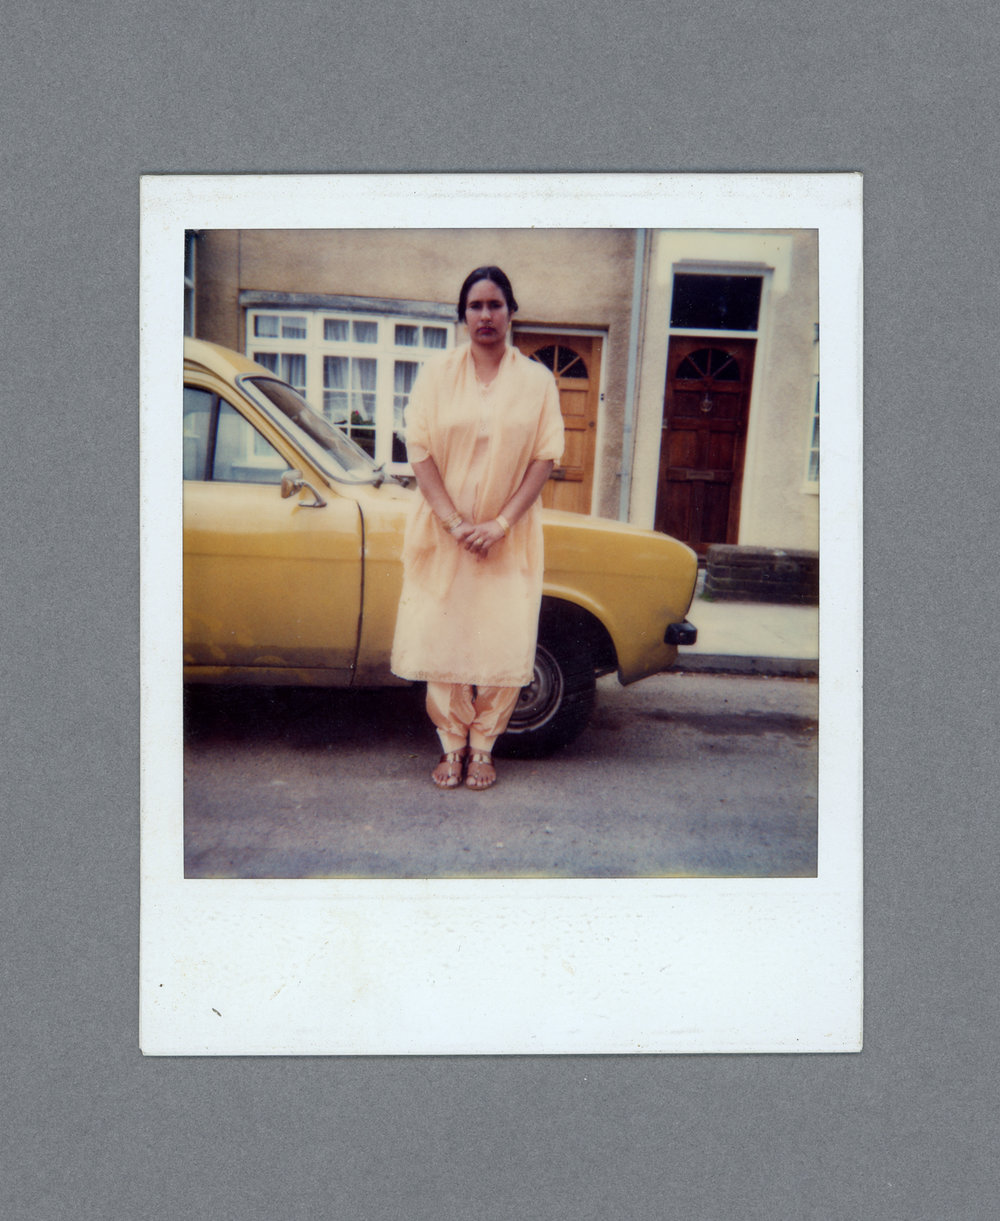 Walpole St. c.1981